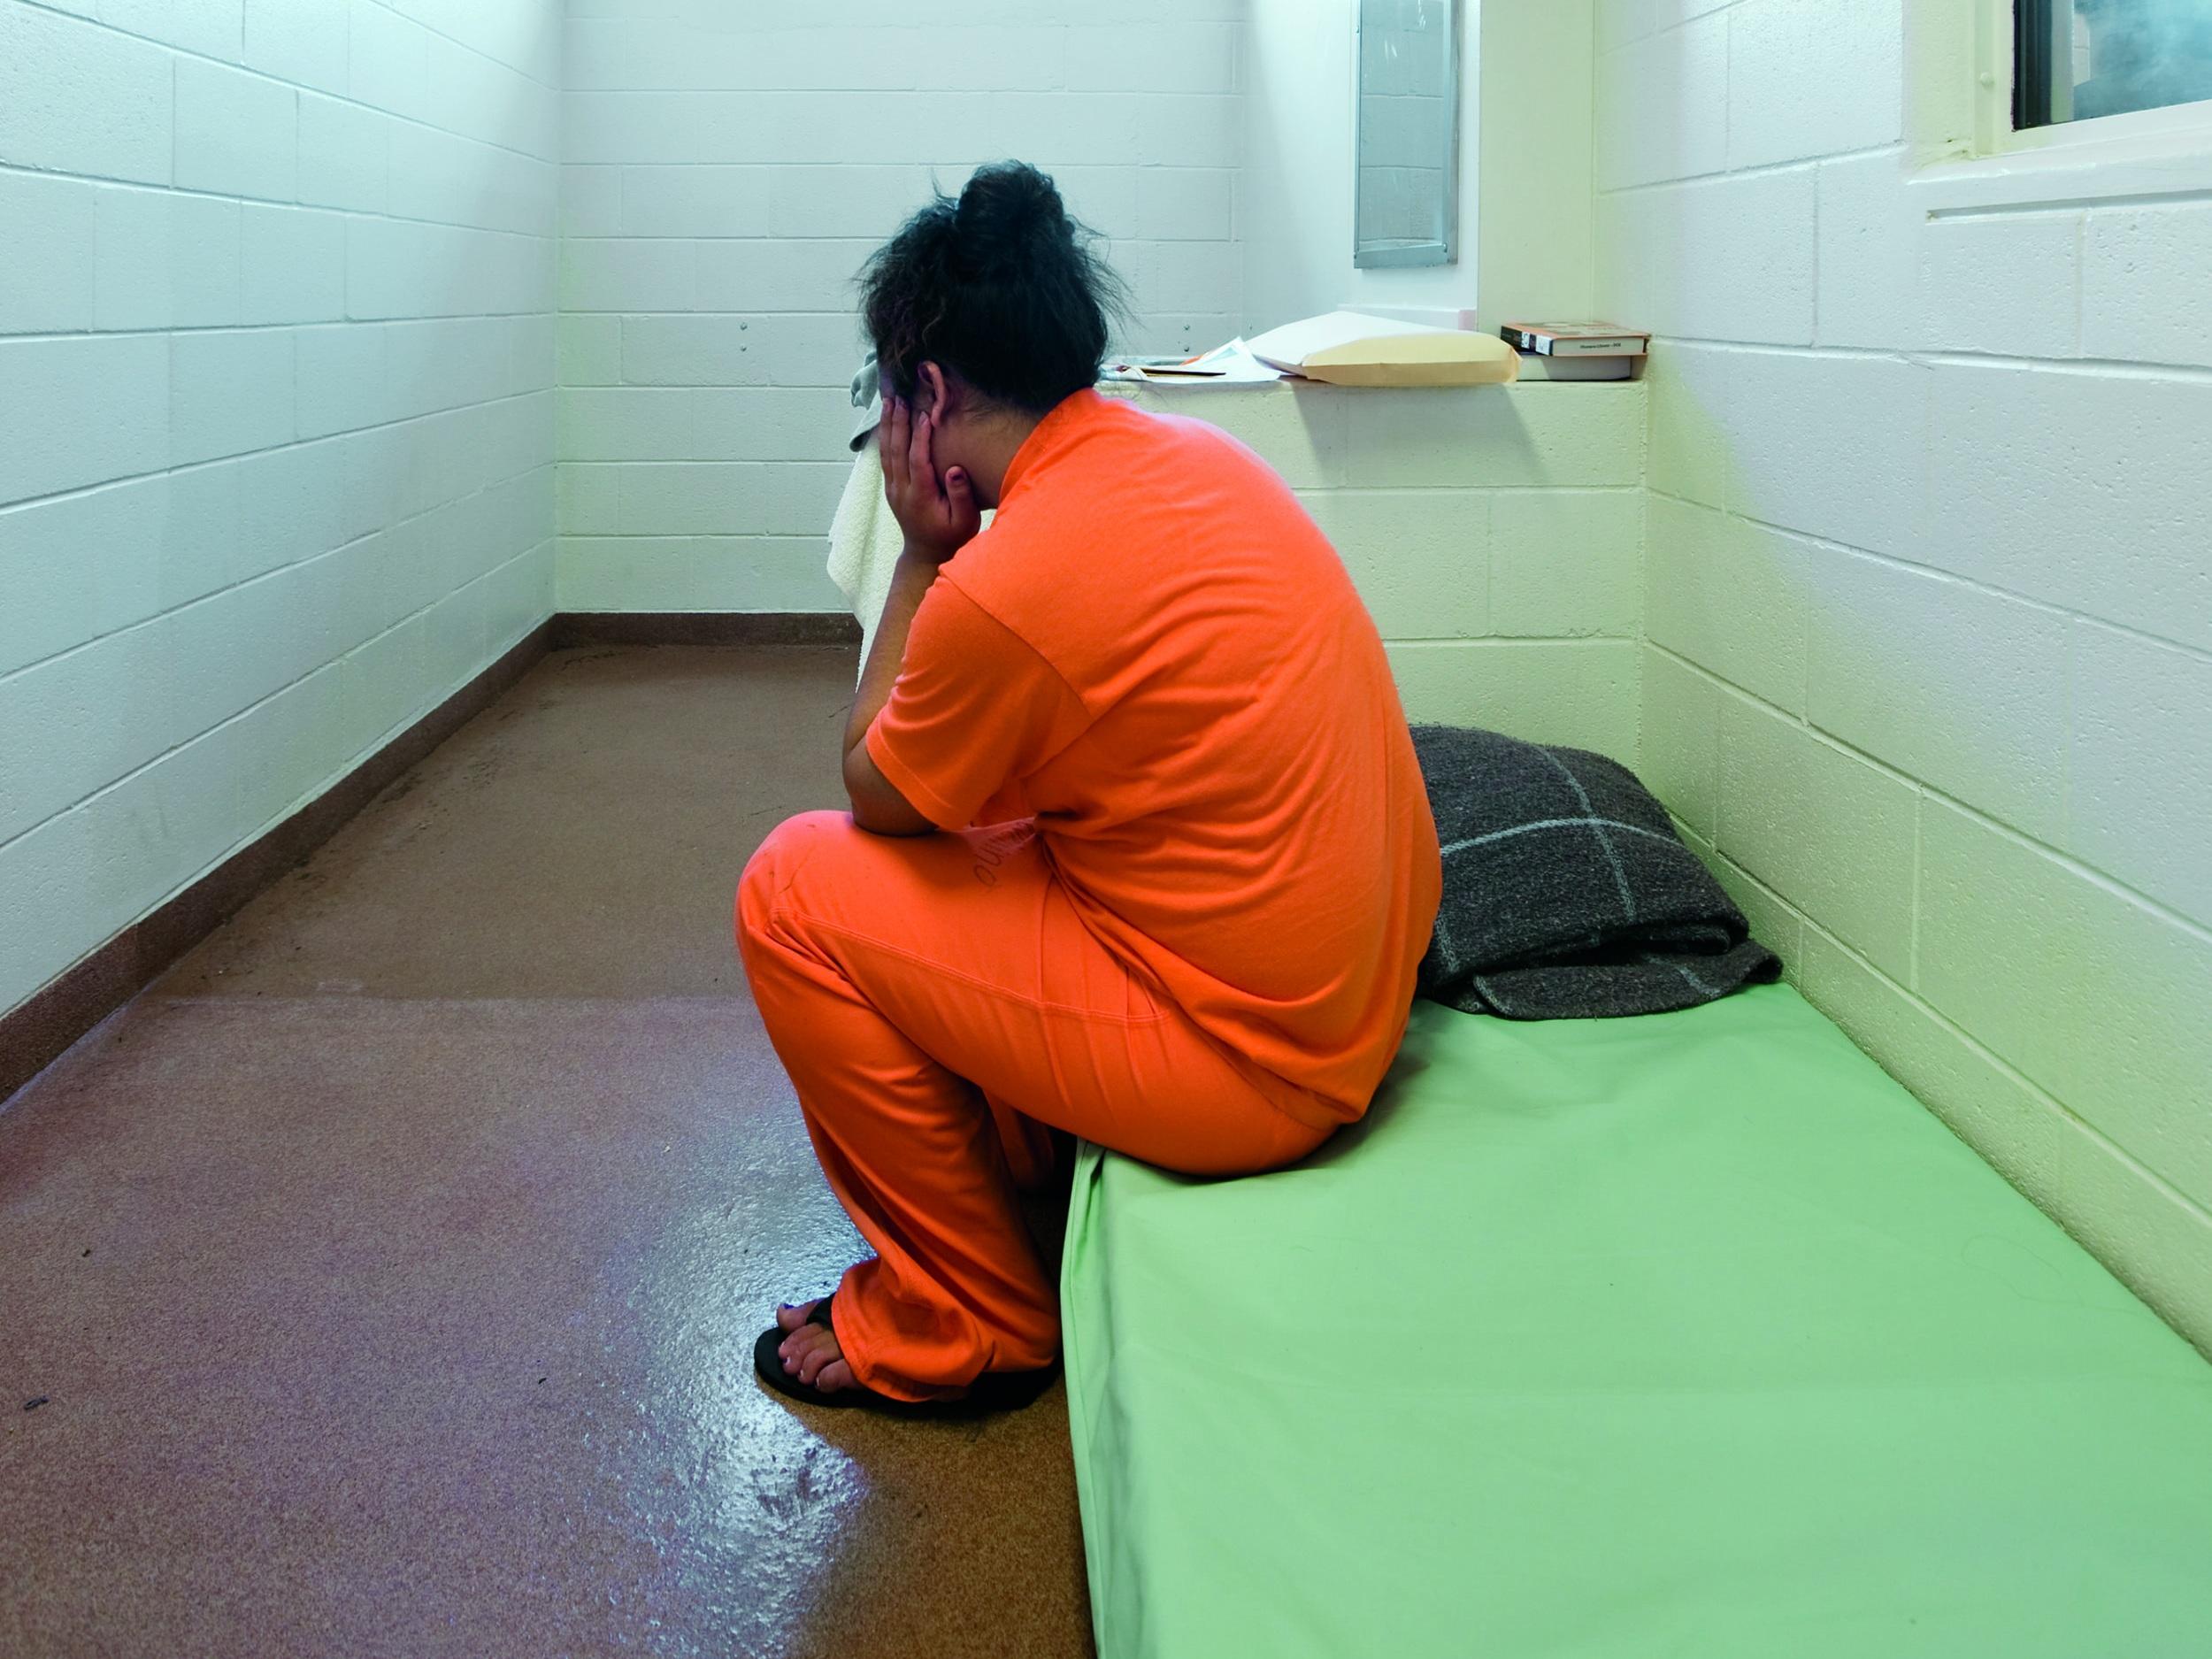 5. Transgender Isolation - Incarcerated transgender youth